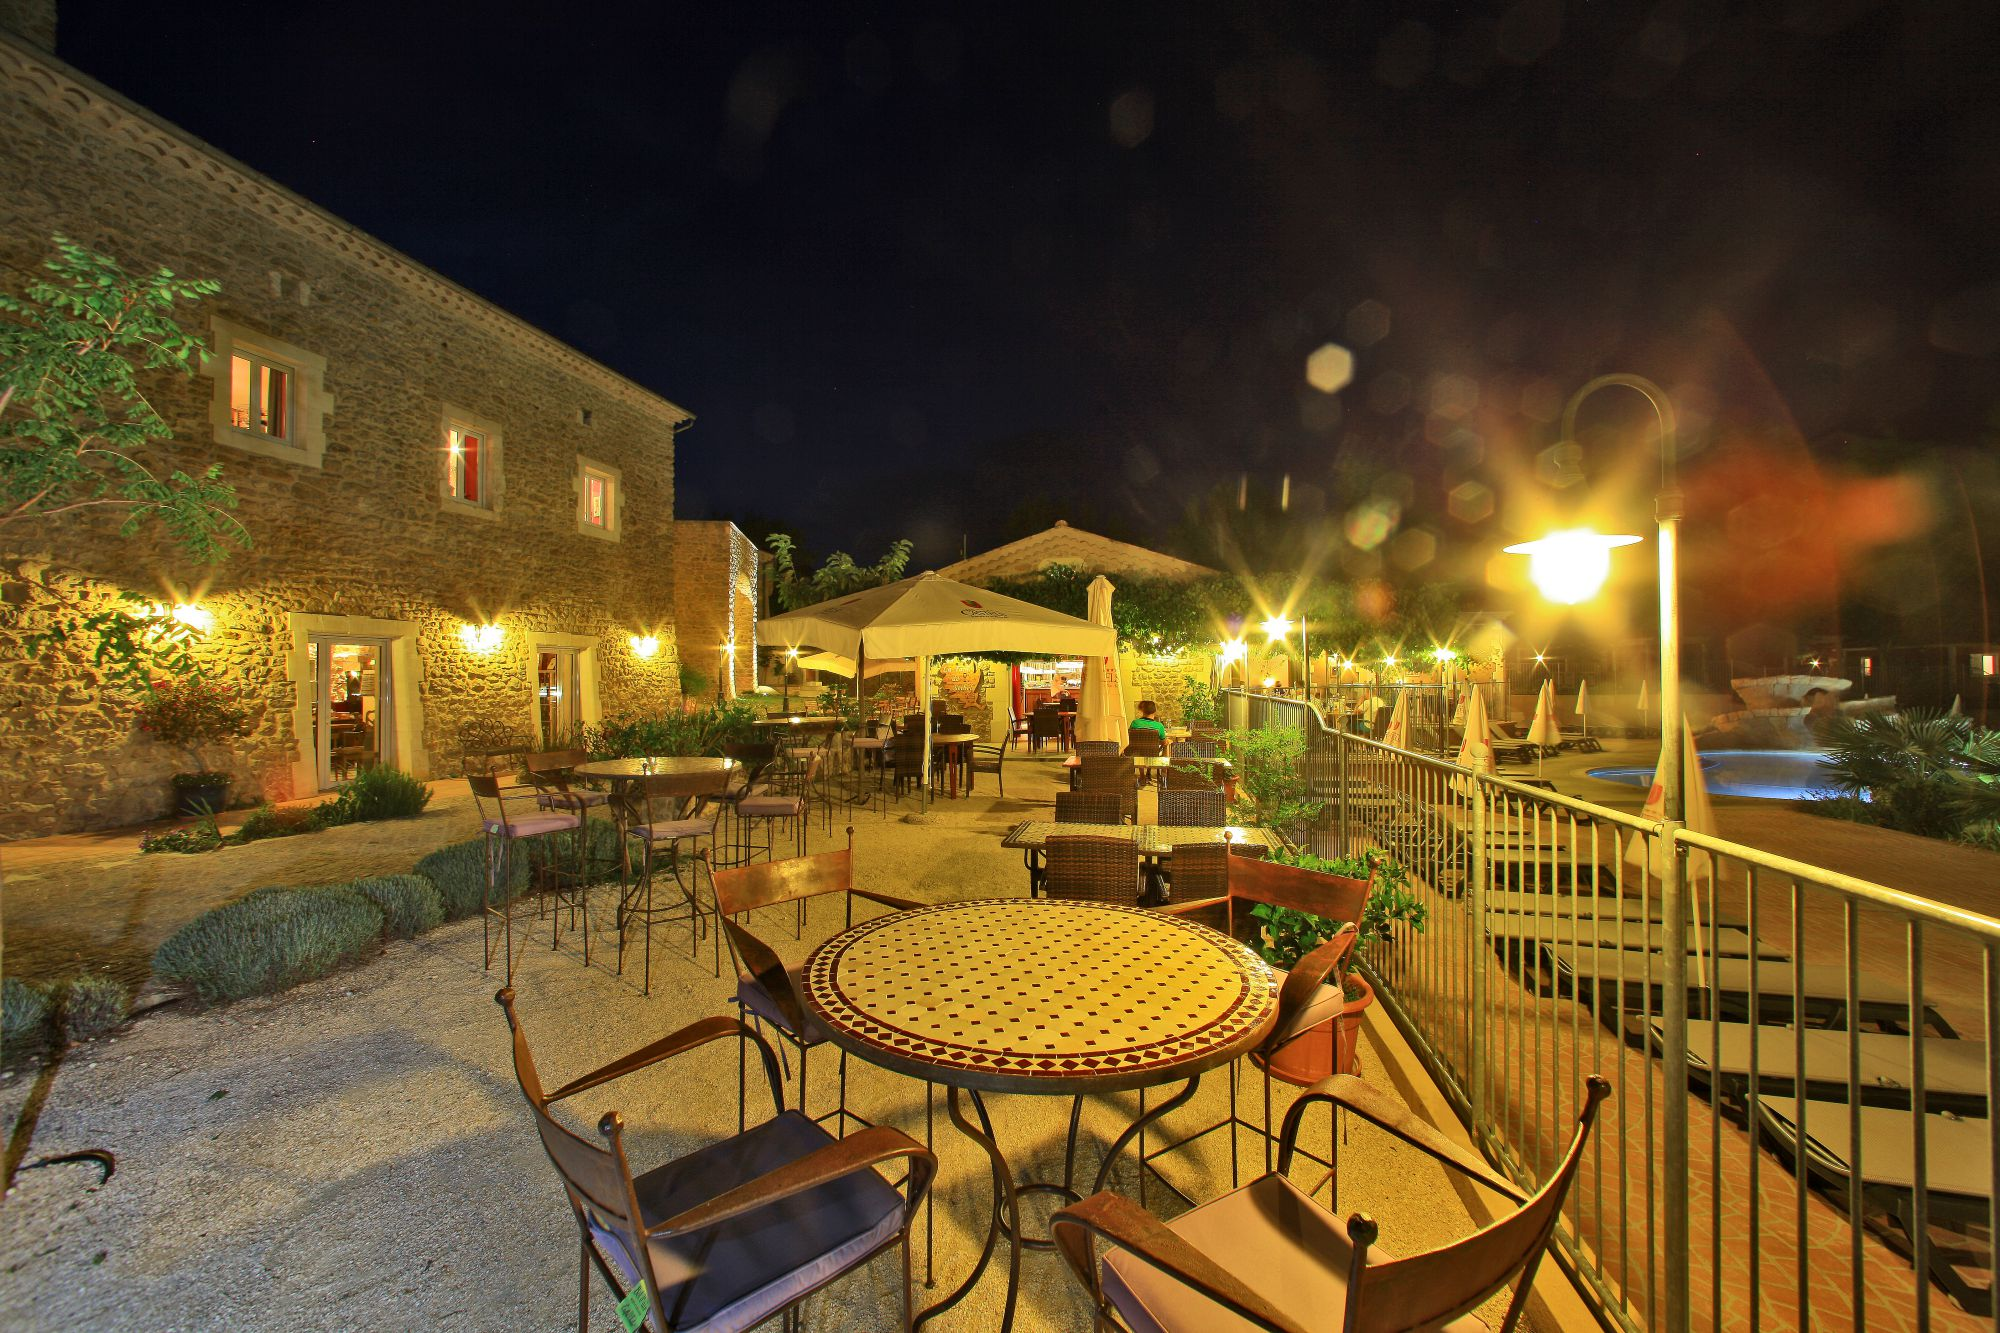 domaine sevenier camping 5 etoiles ardeche restaurant galerie photo4 - On site